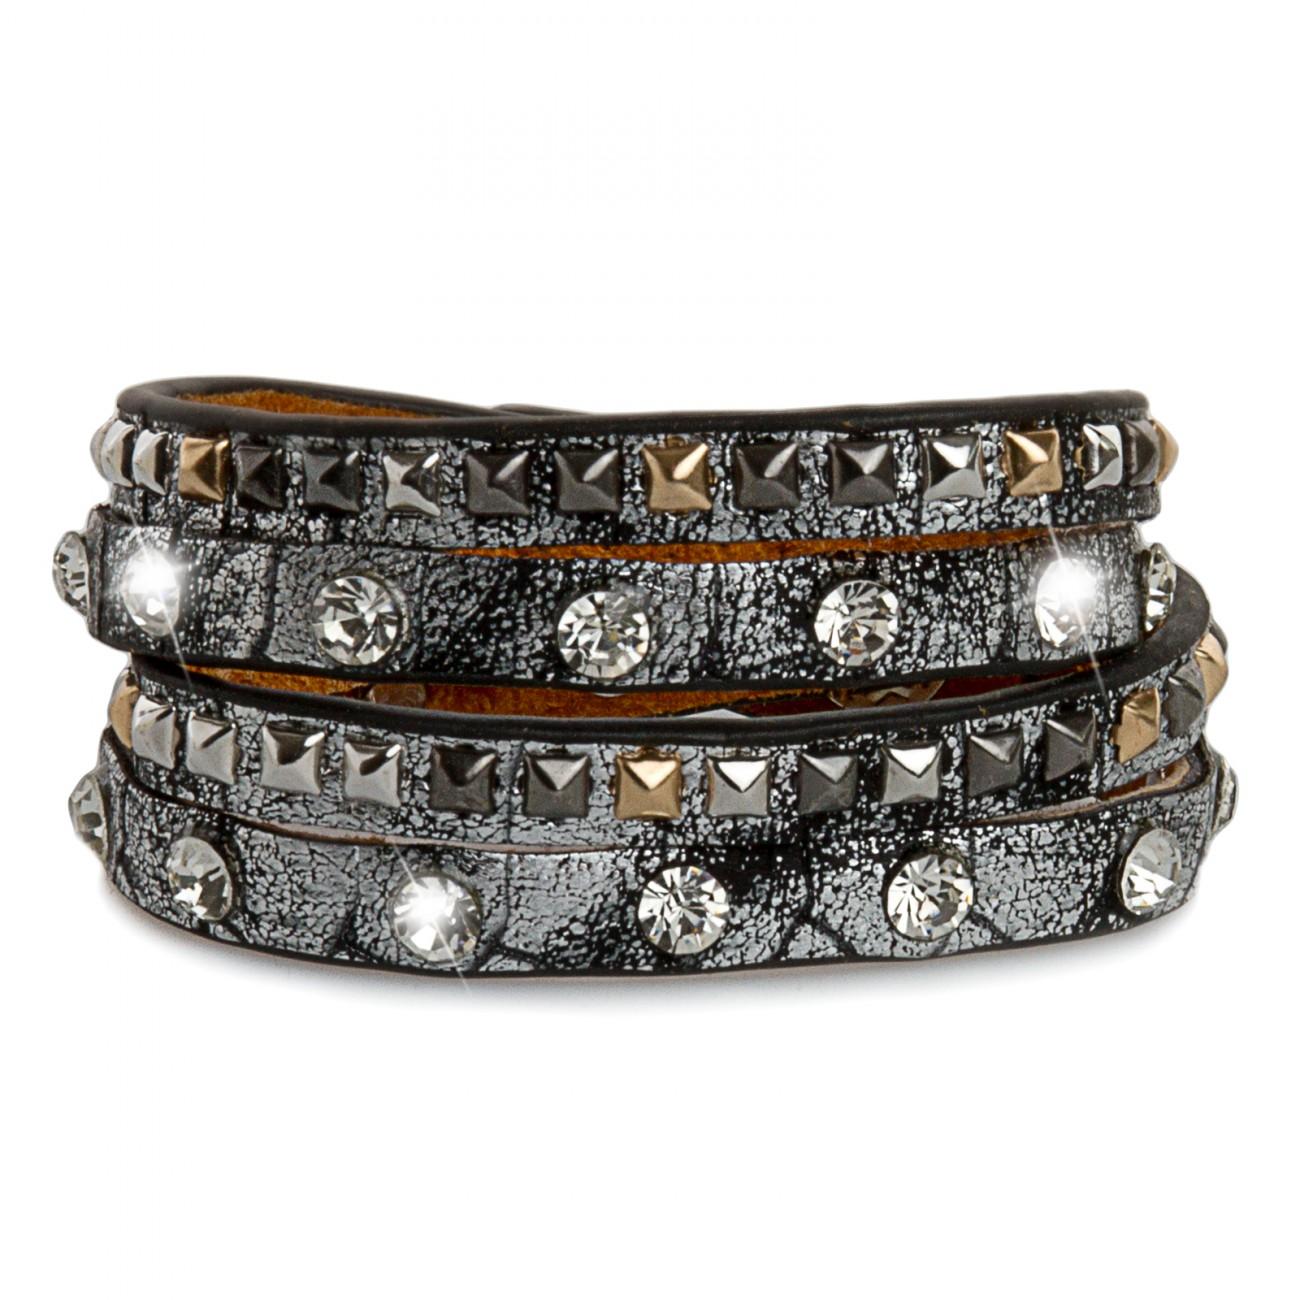 caspar damen armband eckige nieten strass steine wickelarmband kroko muster neu ebay. Black Bedroom Furniture Sets. Home Design Ideas